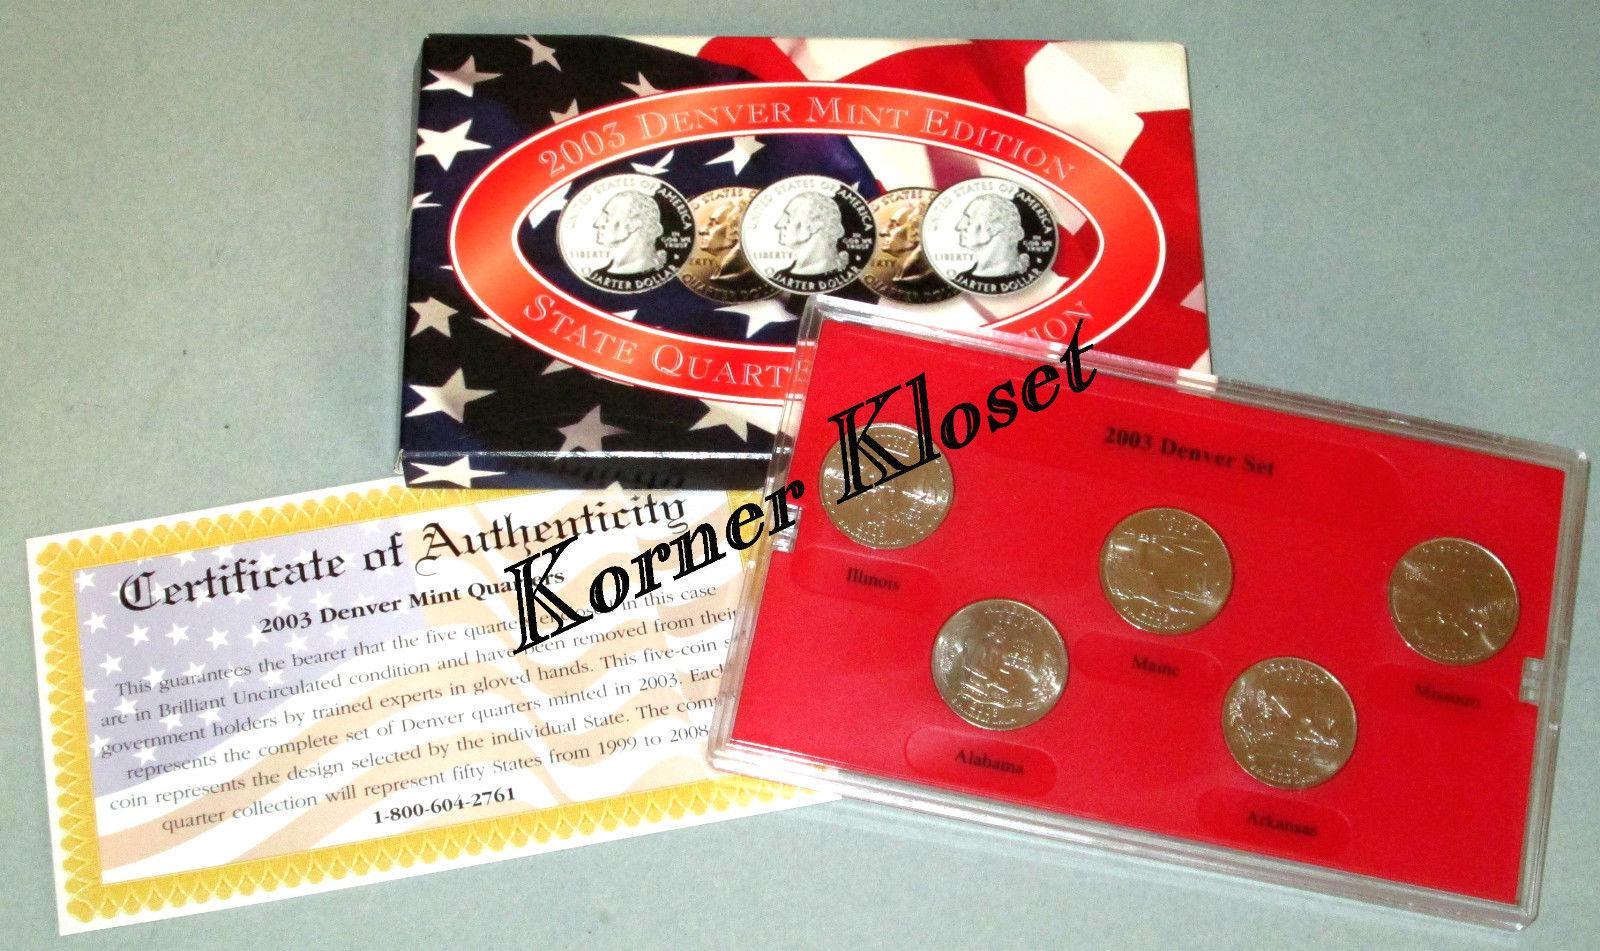 2003 Denver Mint Edition State Quarter Collection - IL, ME, MO, AL, AR - $12.55